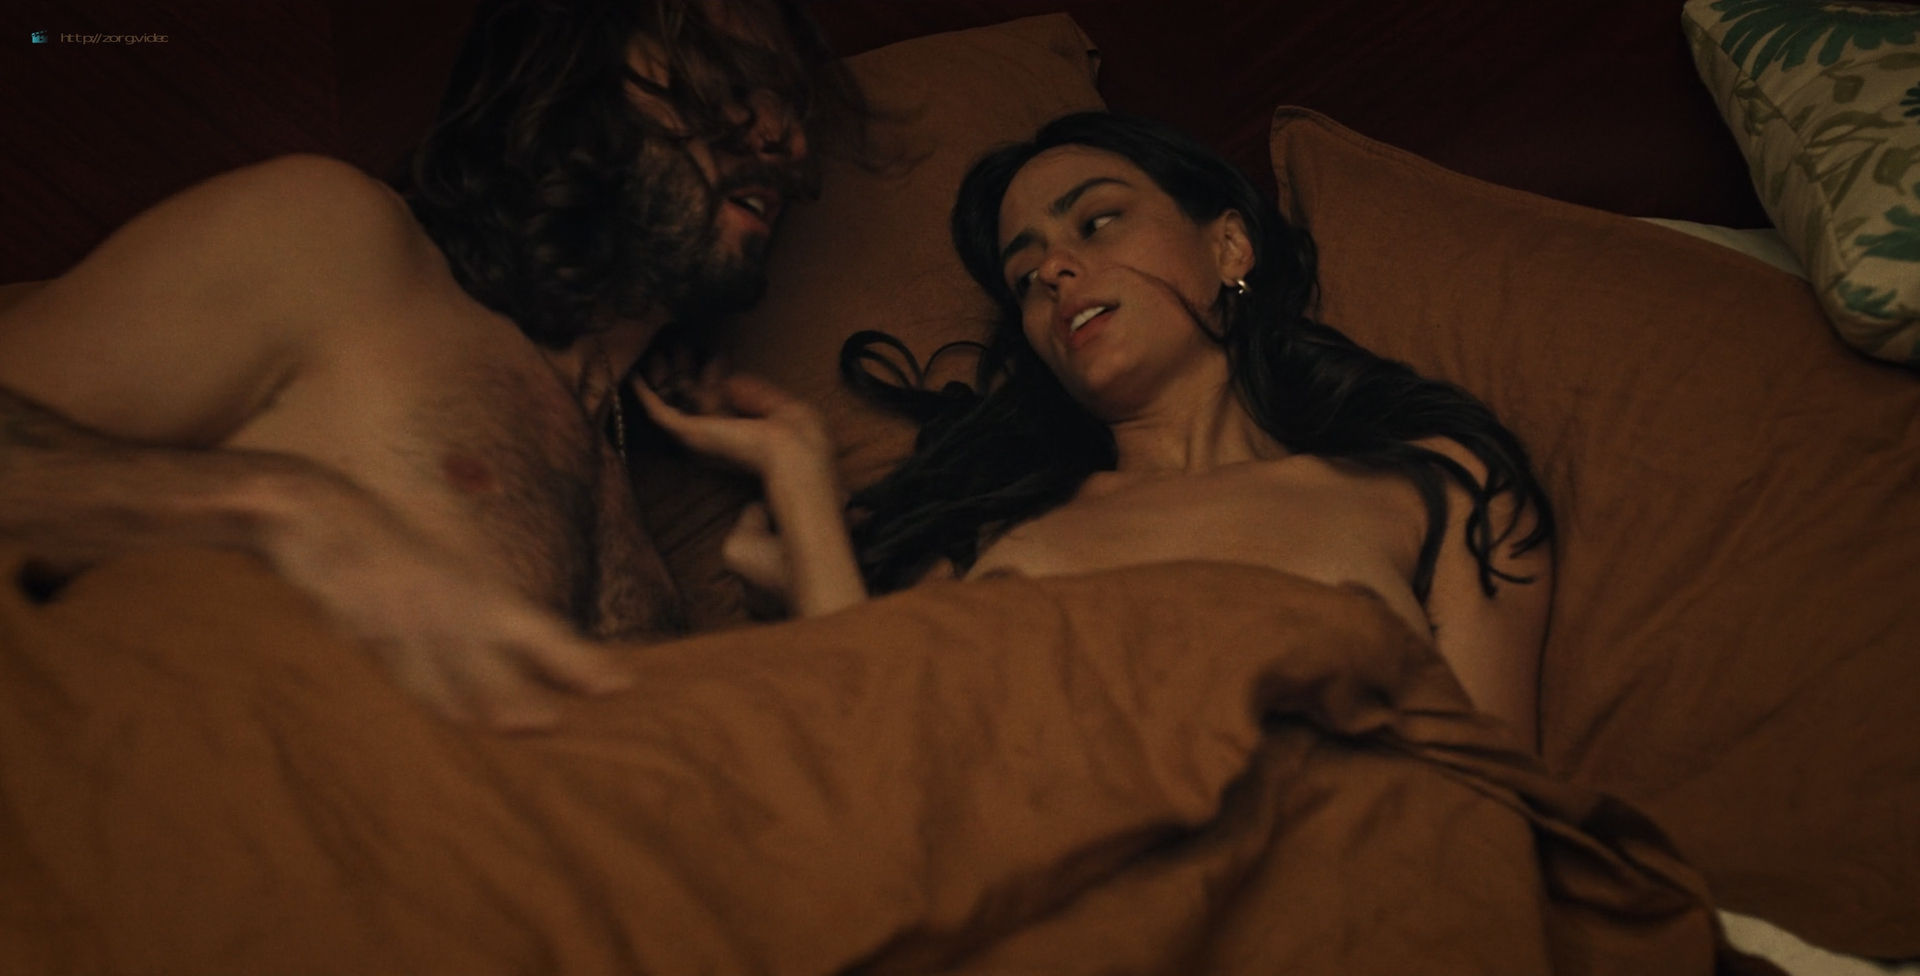 Ana Layevska nude lesbian sex with Florencia Ríos - Yankee (2019) S1 HD 1080p (5)